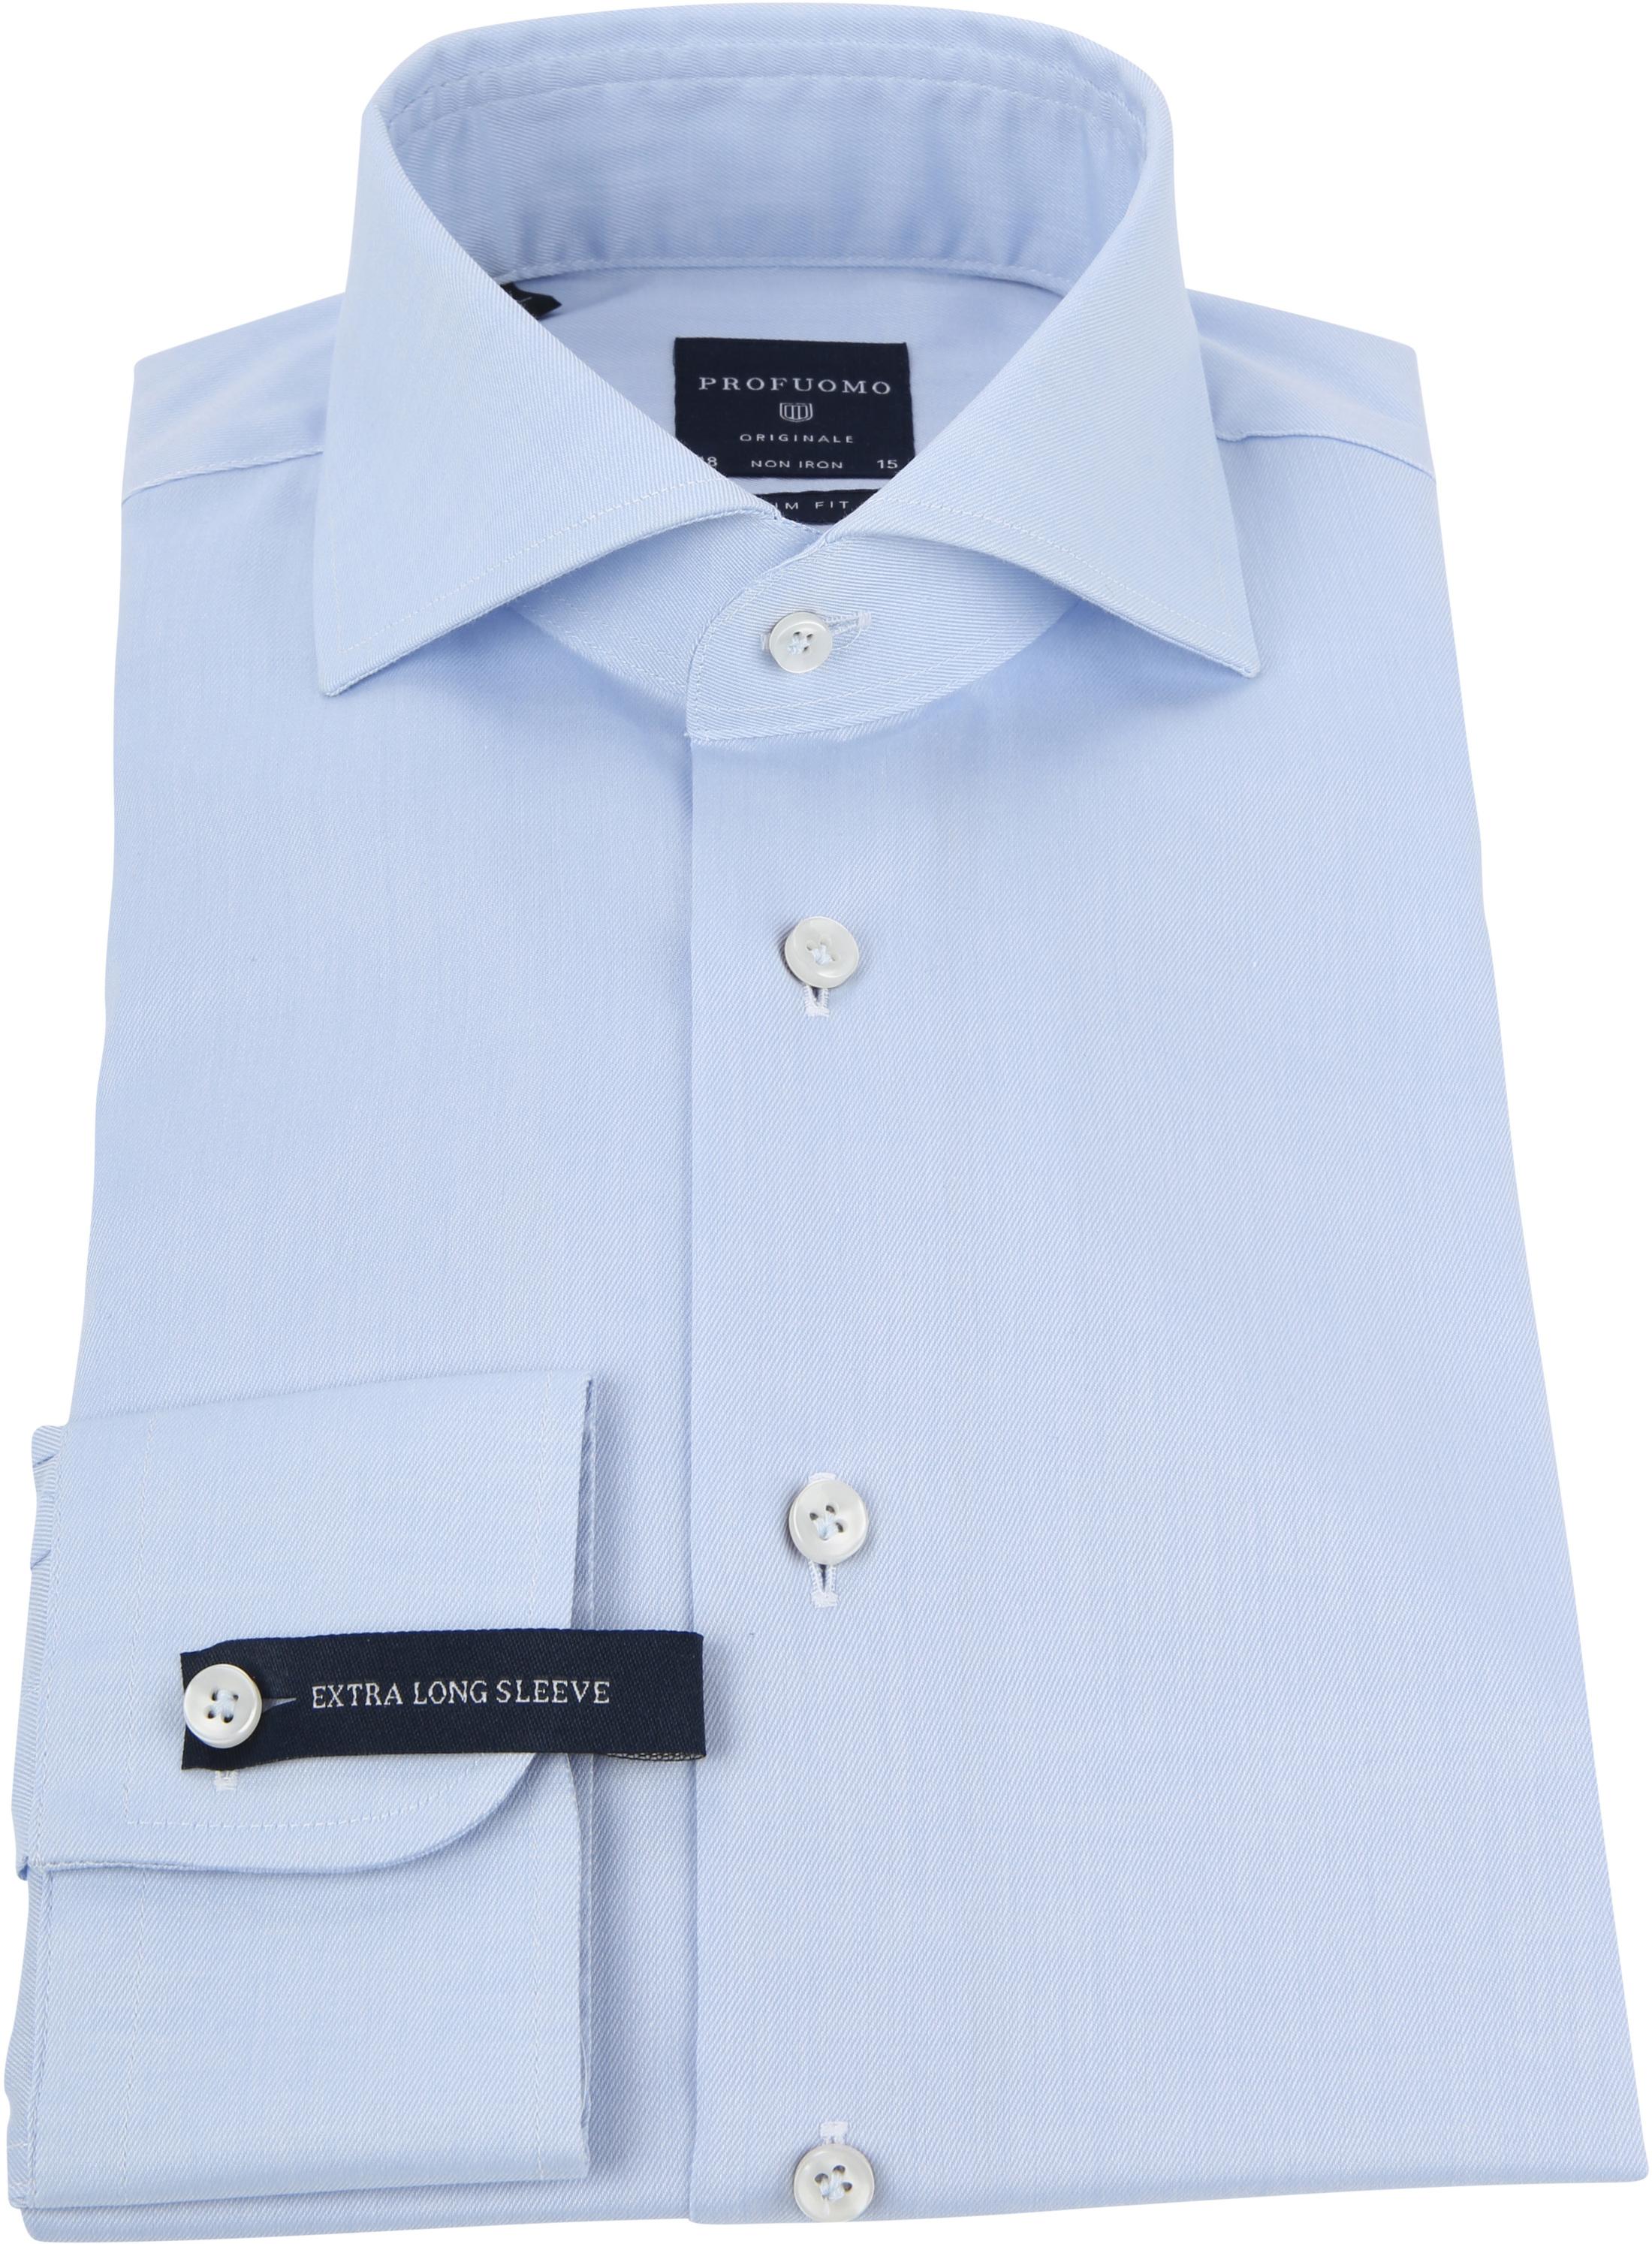 Profuomo Shirt SL7 Cutaway Lichtblauw foto 2